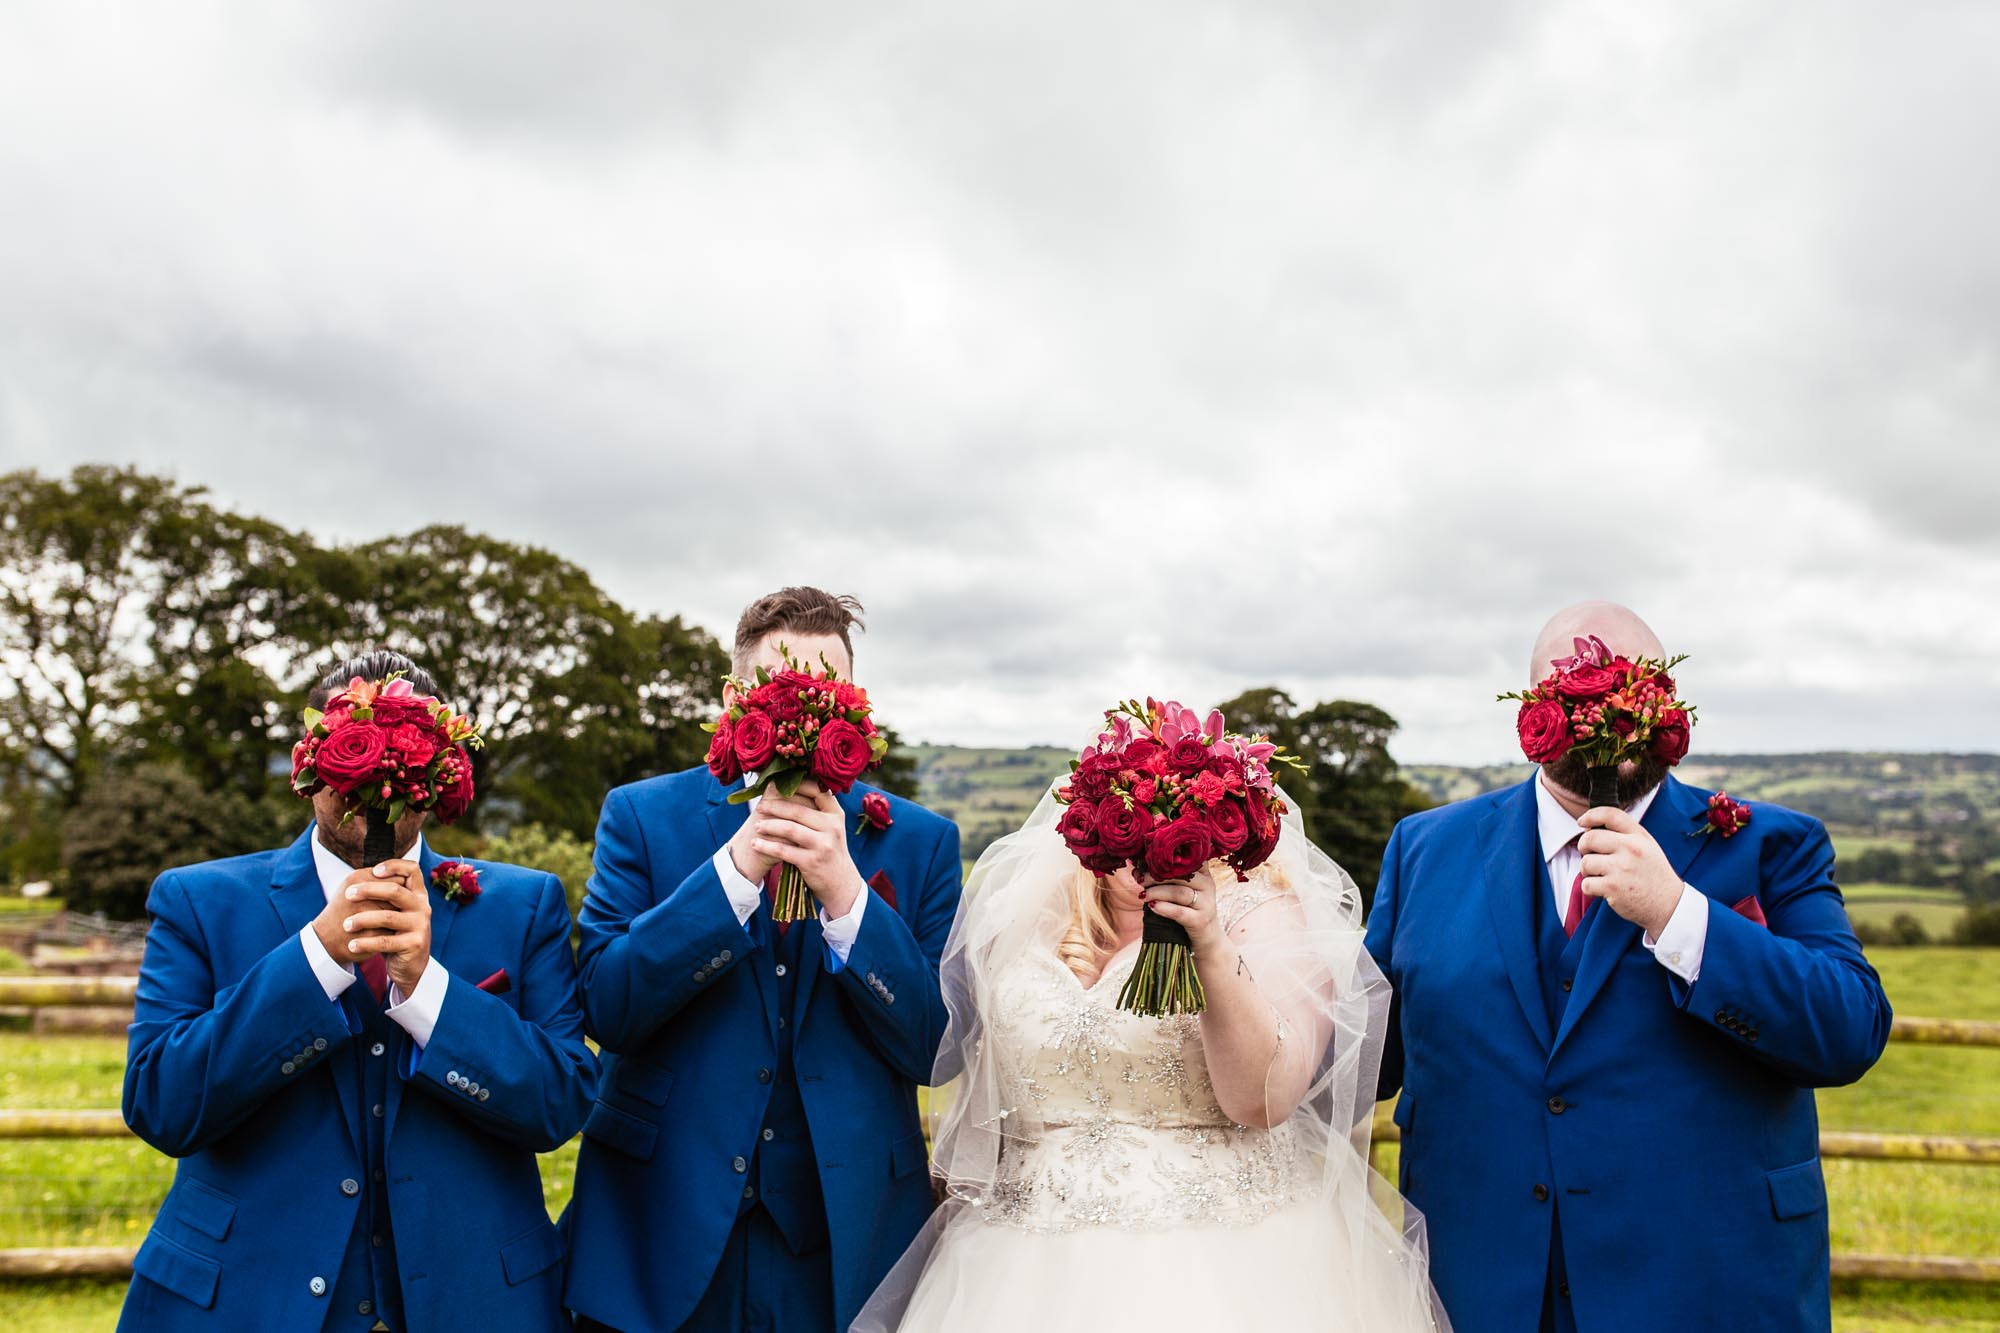 Fun Wedding Photography Heaton House Farm